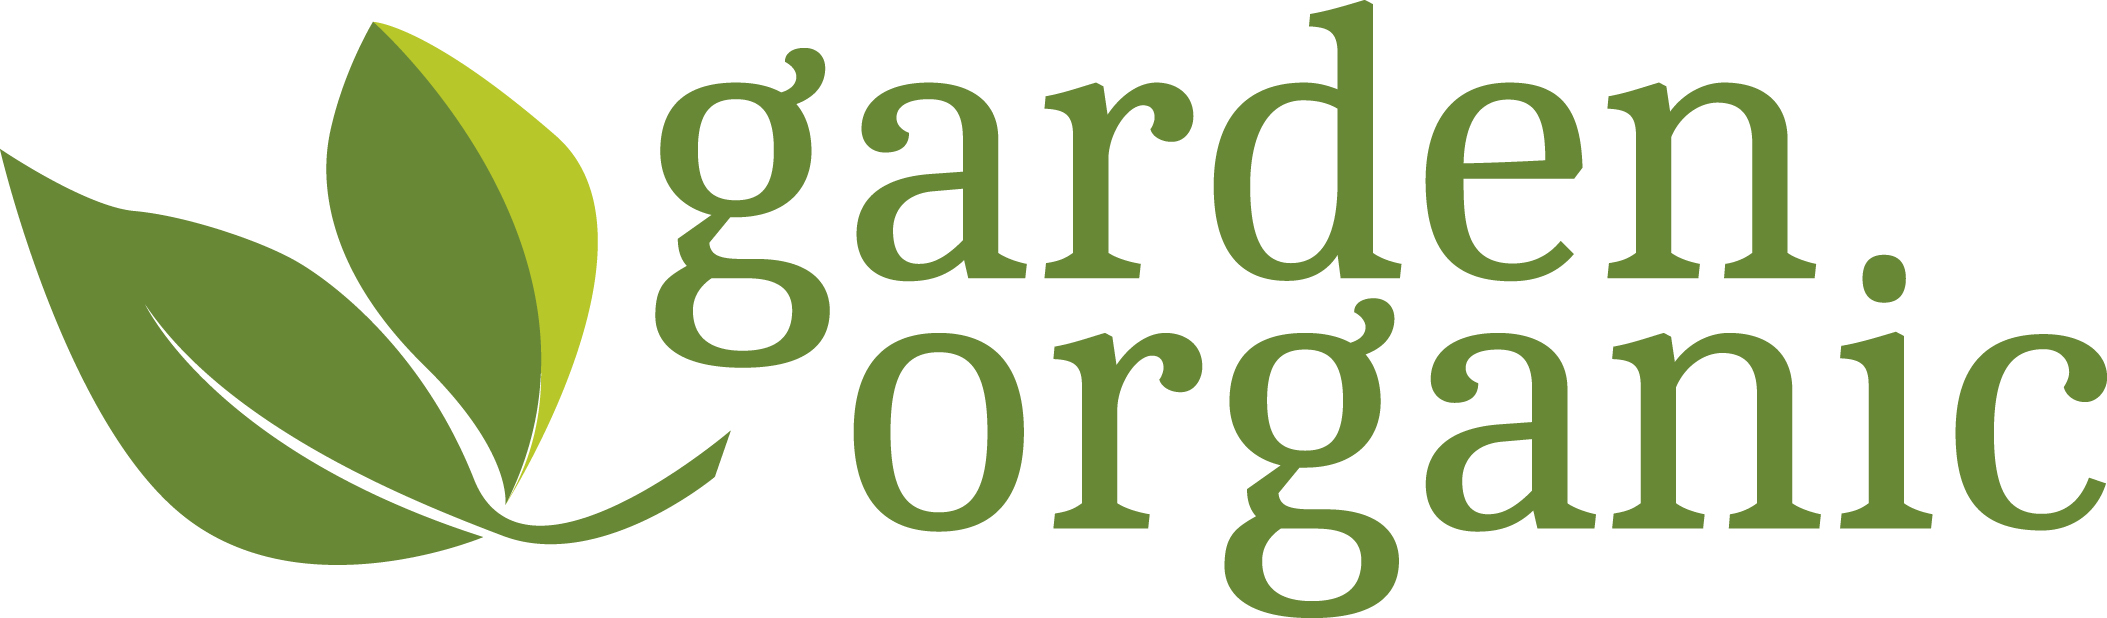 Garden Organic online learning